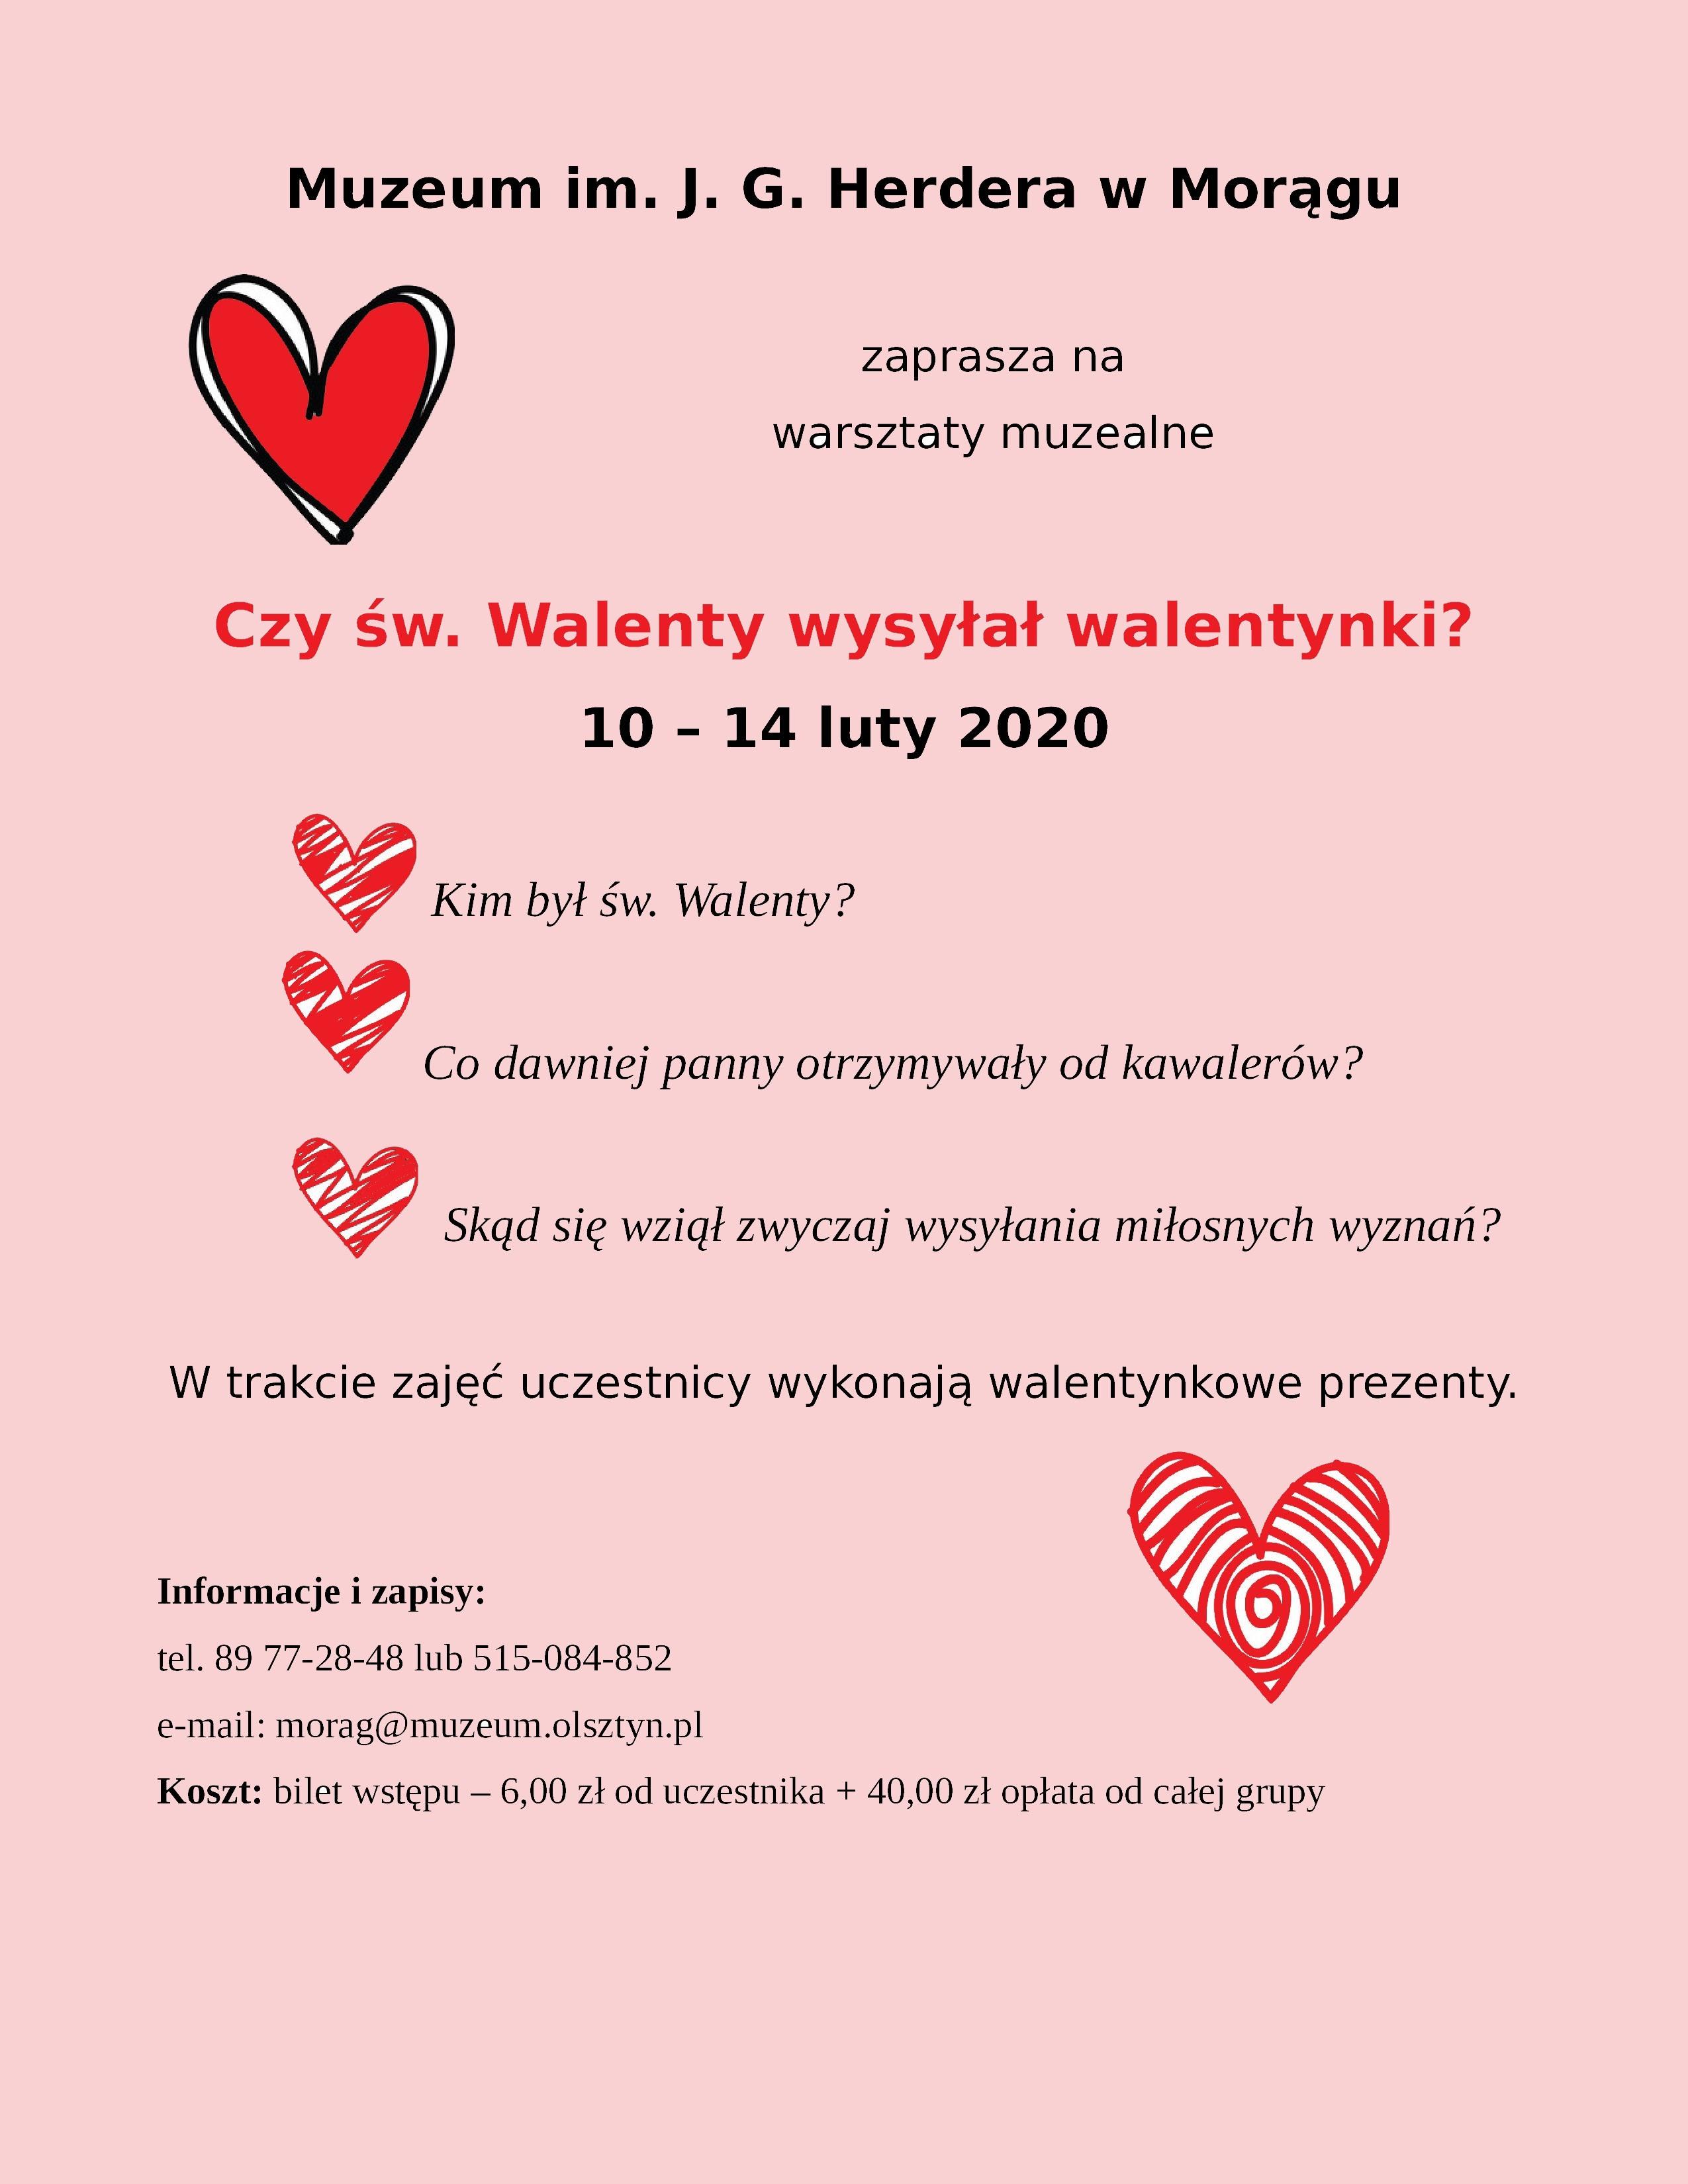 https://m.wmwm.pl/2020/02/orig/ulotka-walentynki-2020-jpg-6593.jpg